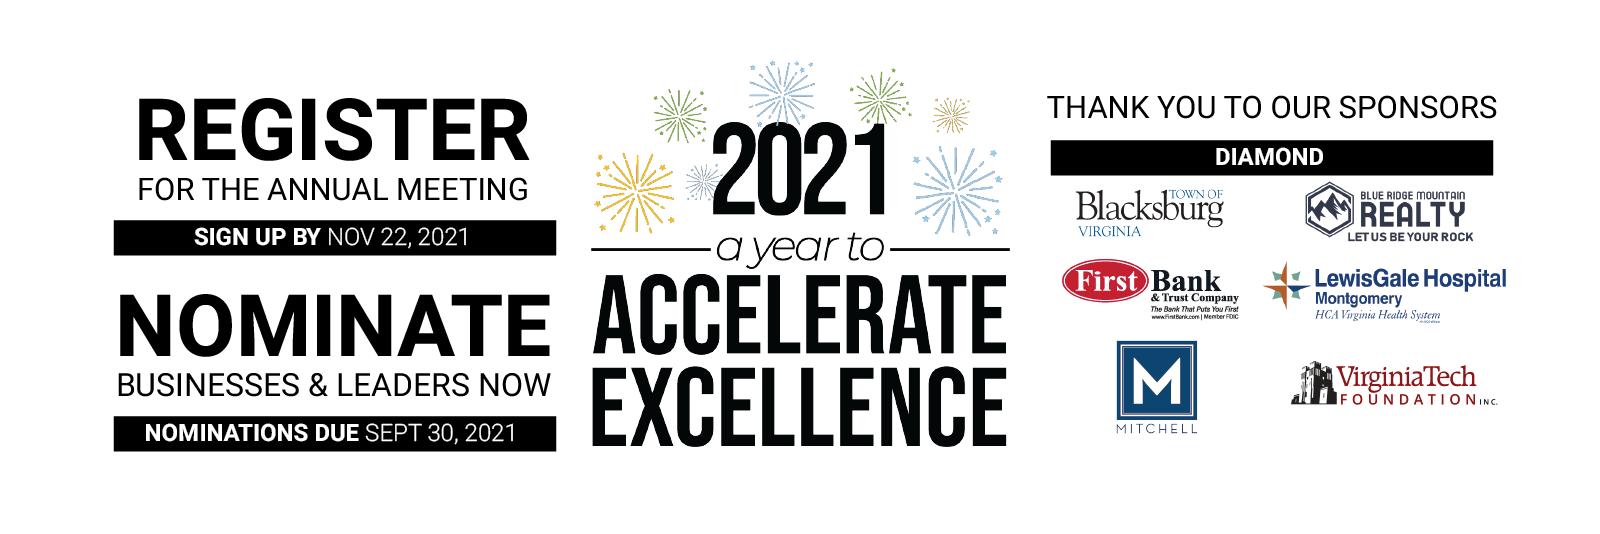 annual-meeting-web-banner-2021_diamond-sponsors-02.png